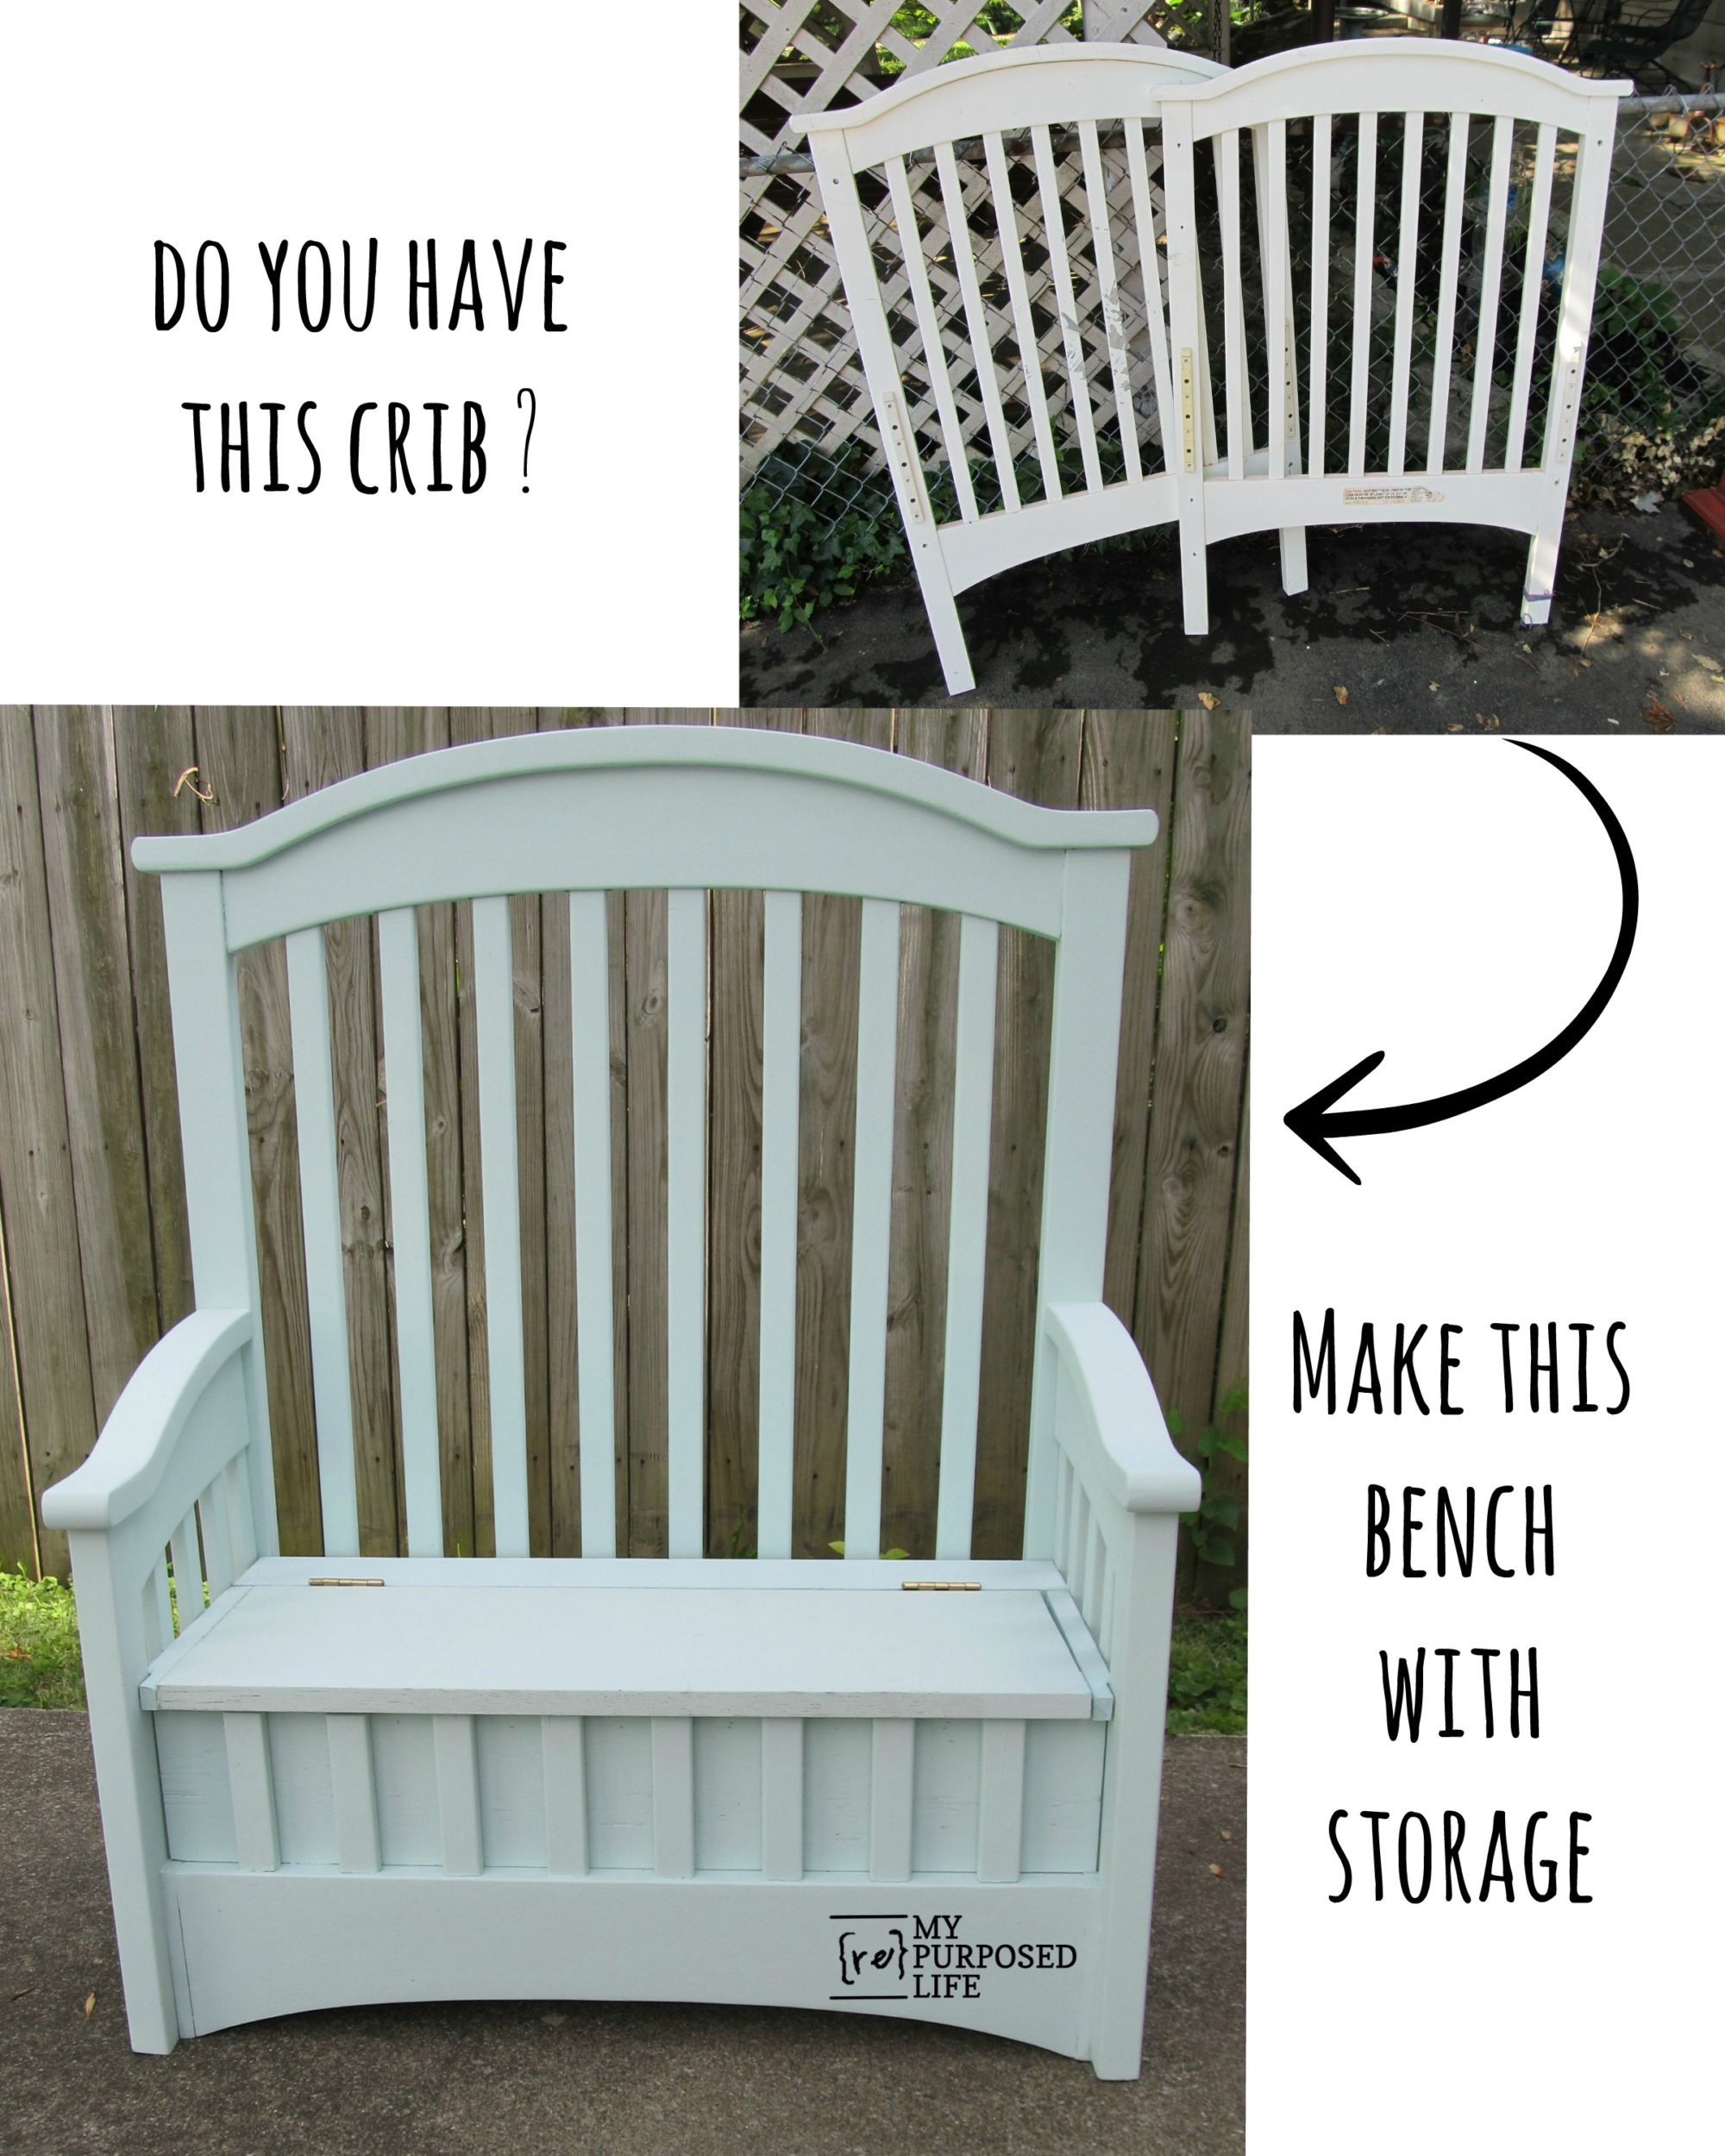 Repurposed Crib into Toy Box Bench - My Repurposed Life™